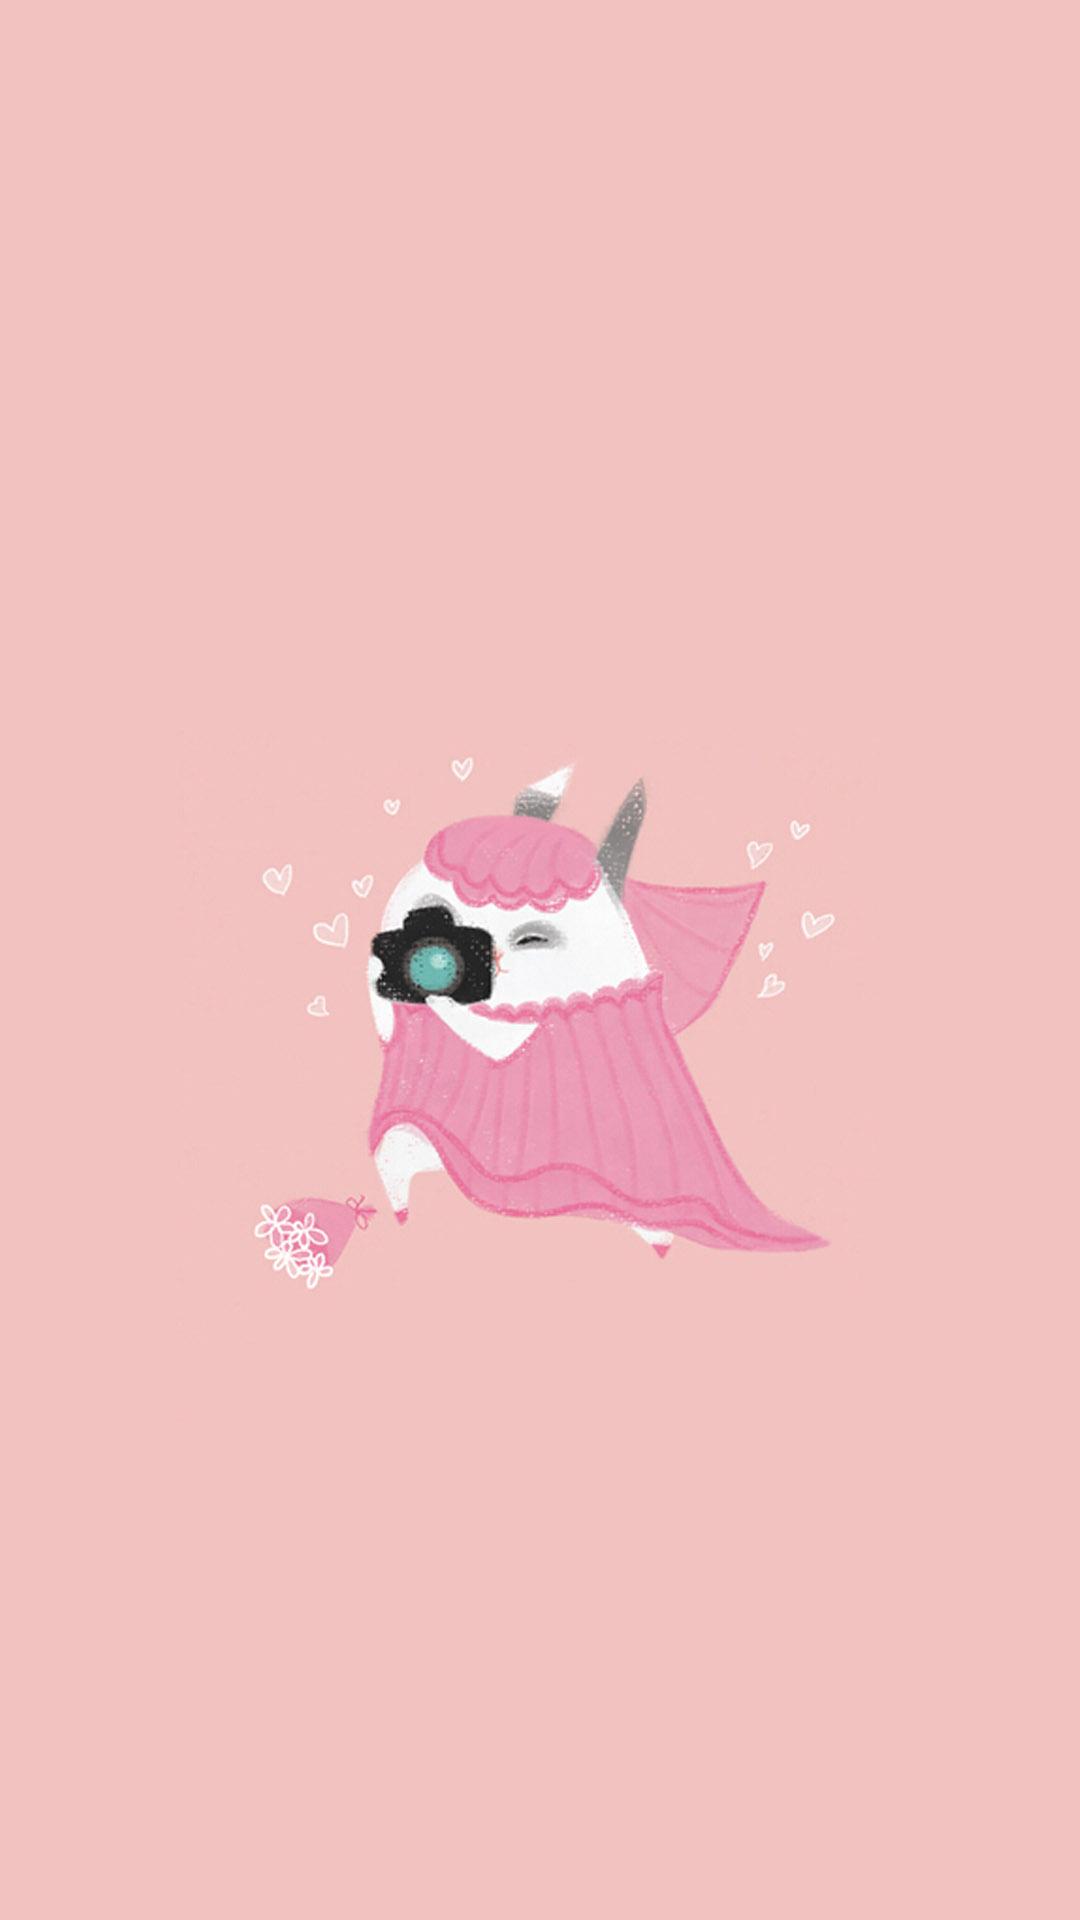 【v粉壁纸】可爱卡通手绘小兔子高清图片手机壁纸